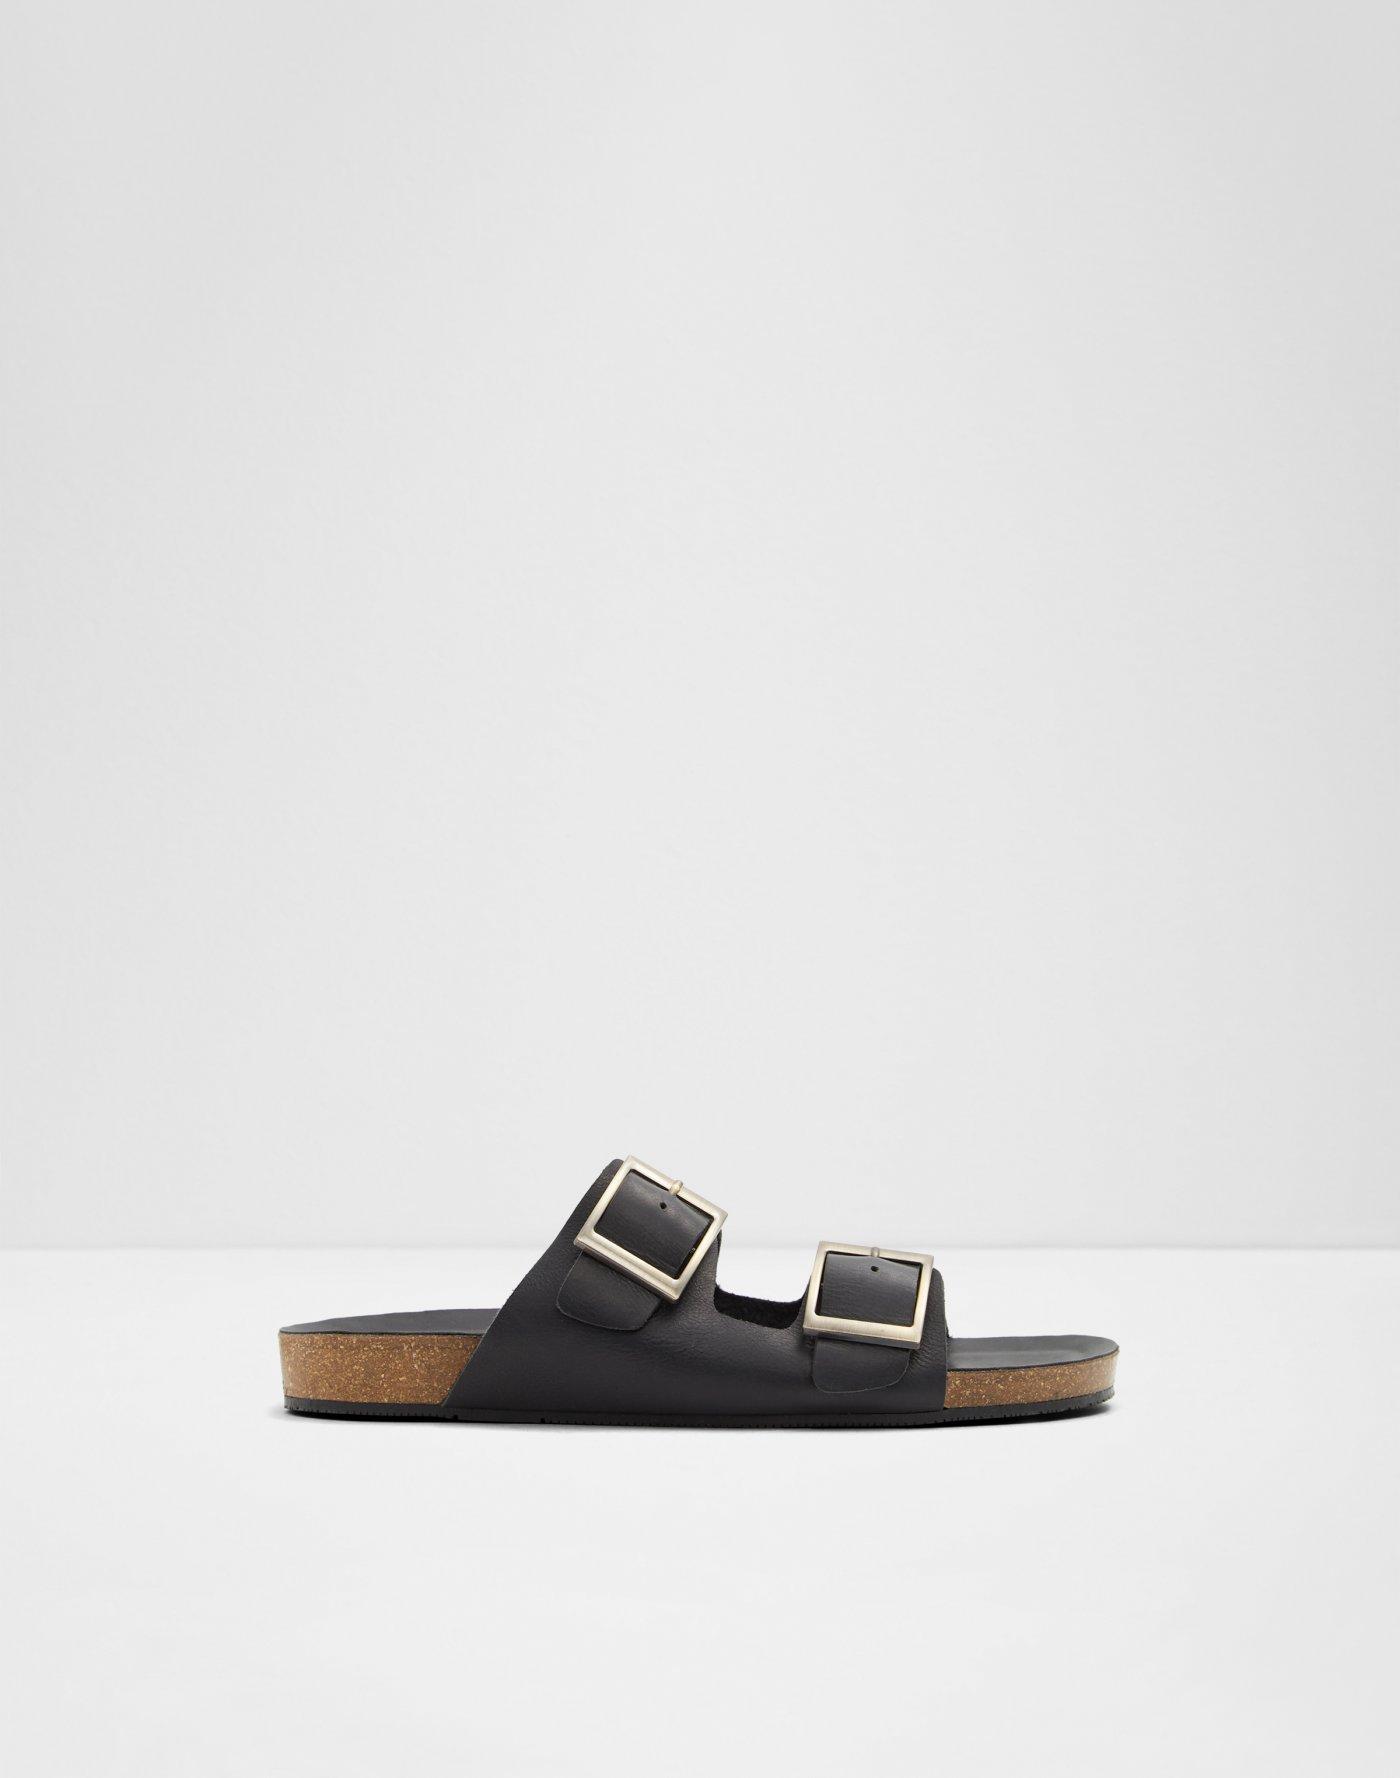 f977add956f Aldo Shoes Men S Slippers - Style Guru  Fashion